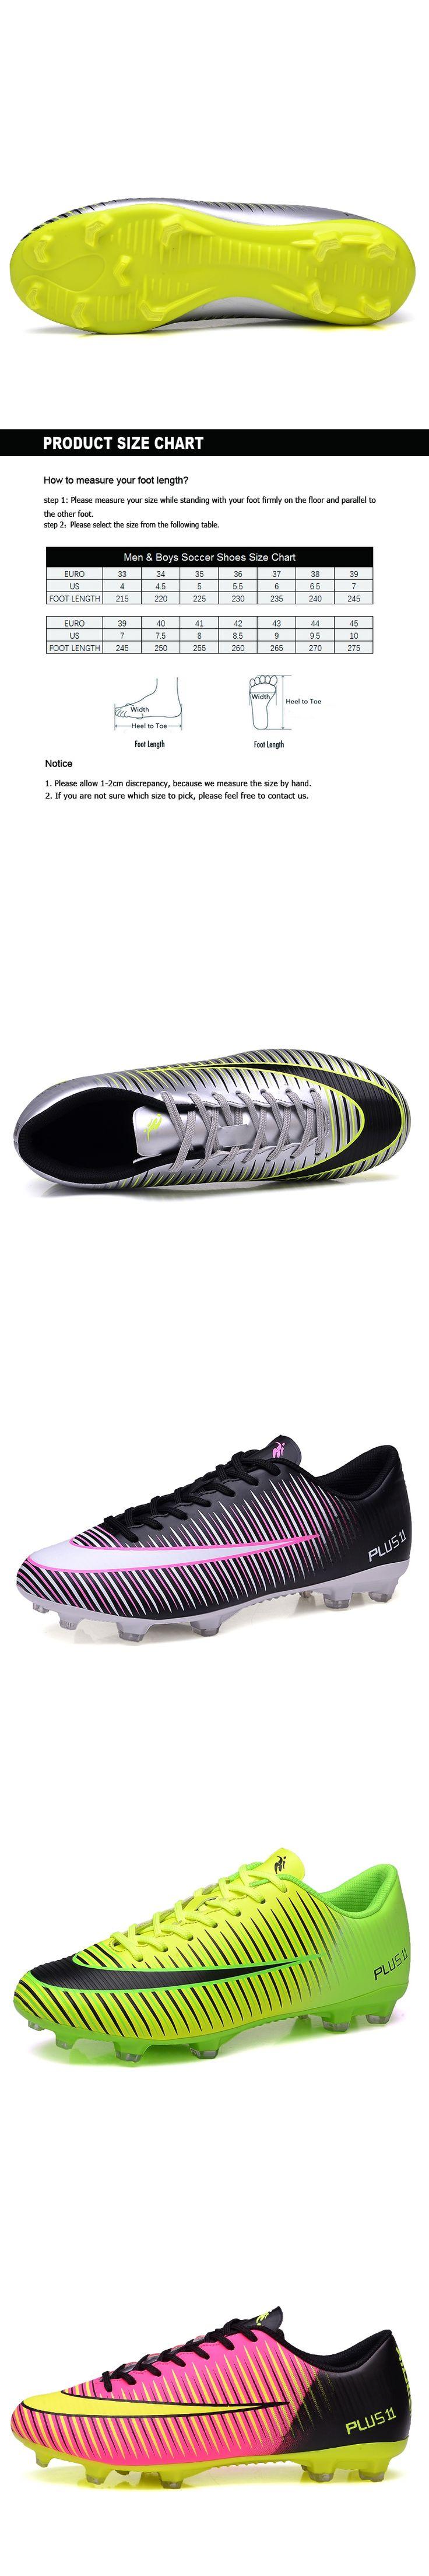 Ibuller Men Soccer Shoes Boys Football Boots Outdoor Soccer Cleats AG for Artificial Grass Ground Chuteiras Size 33-44 S157